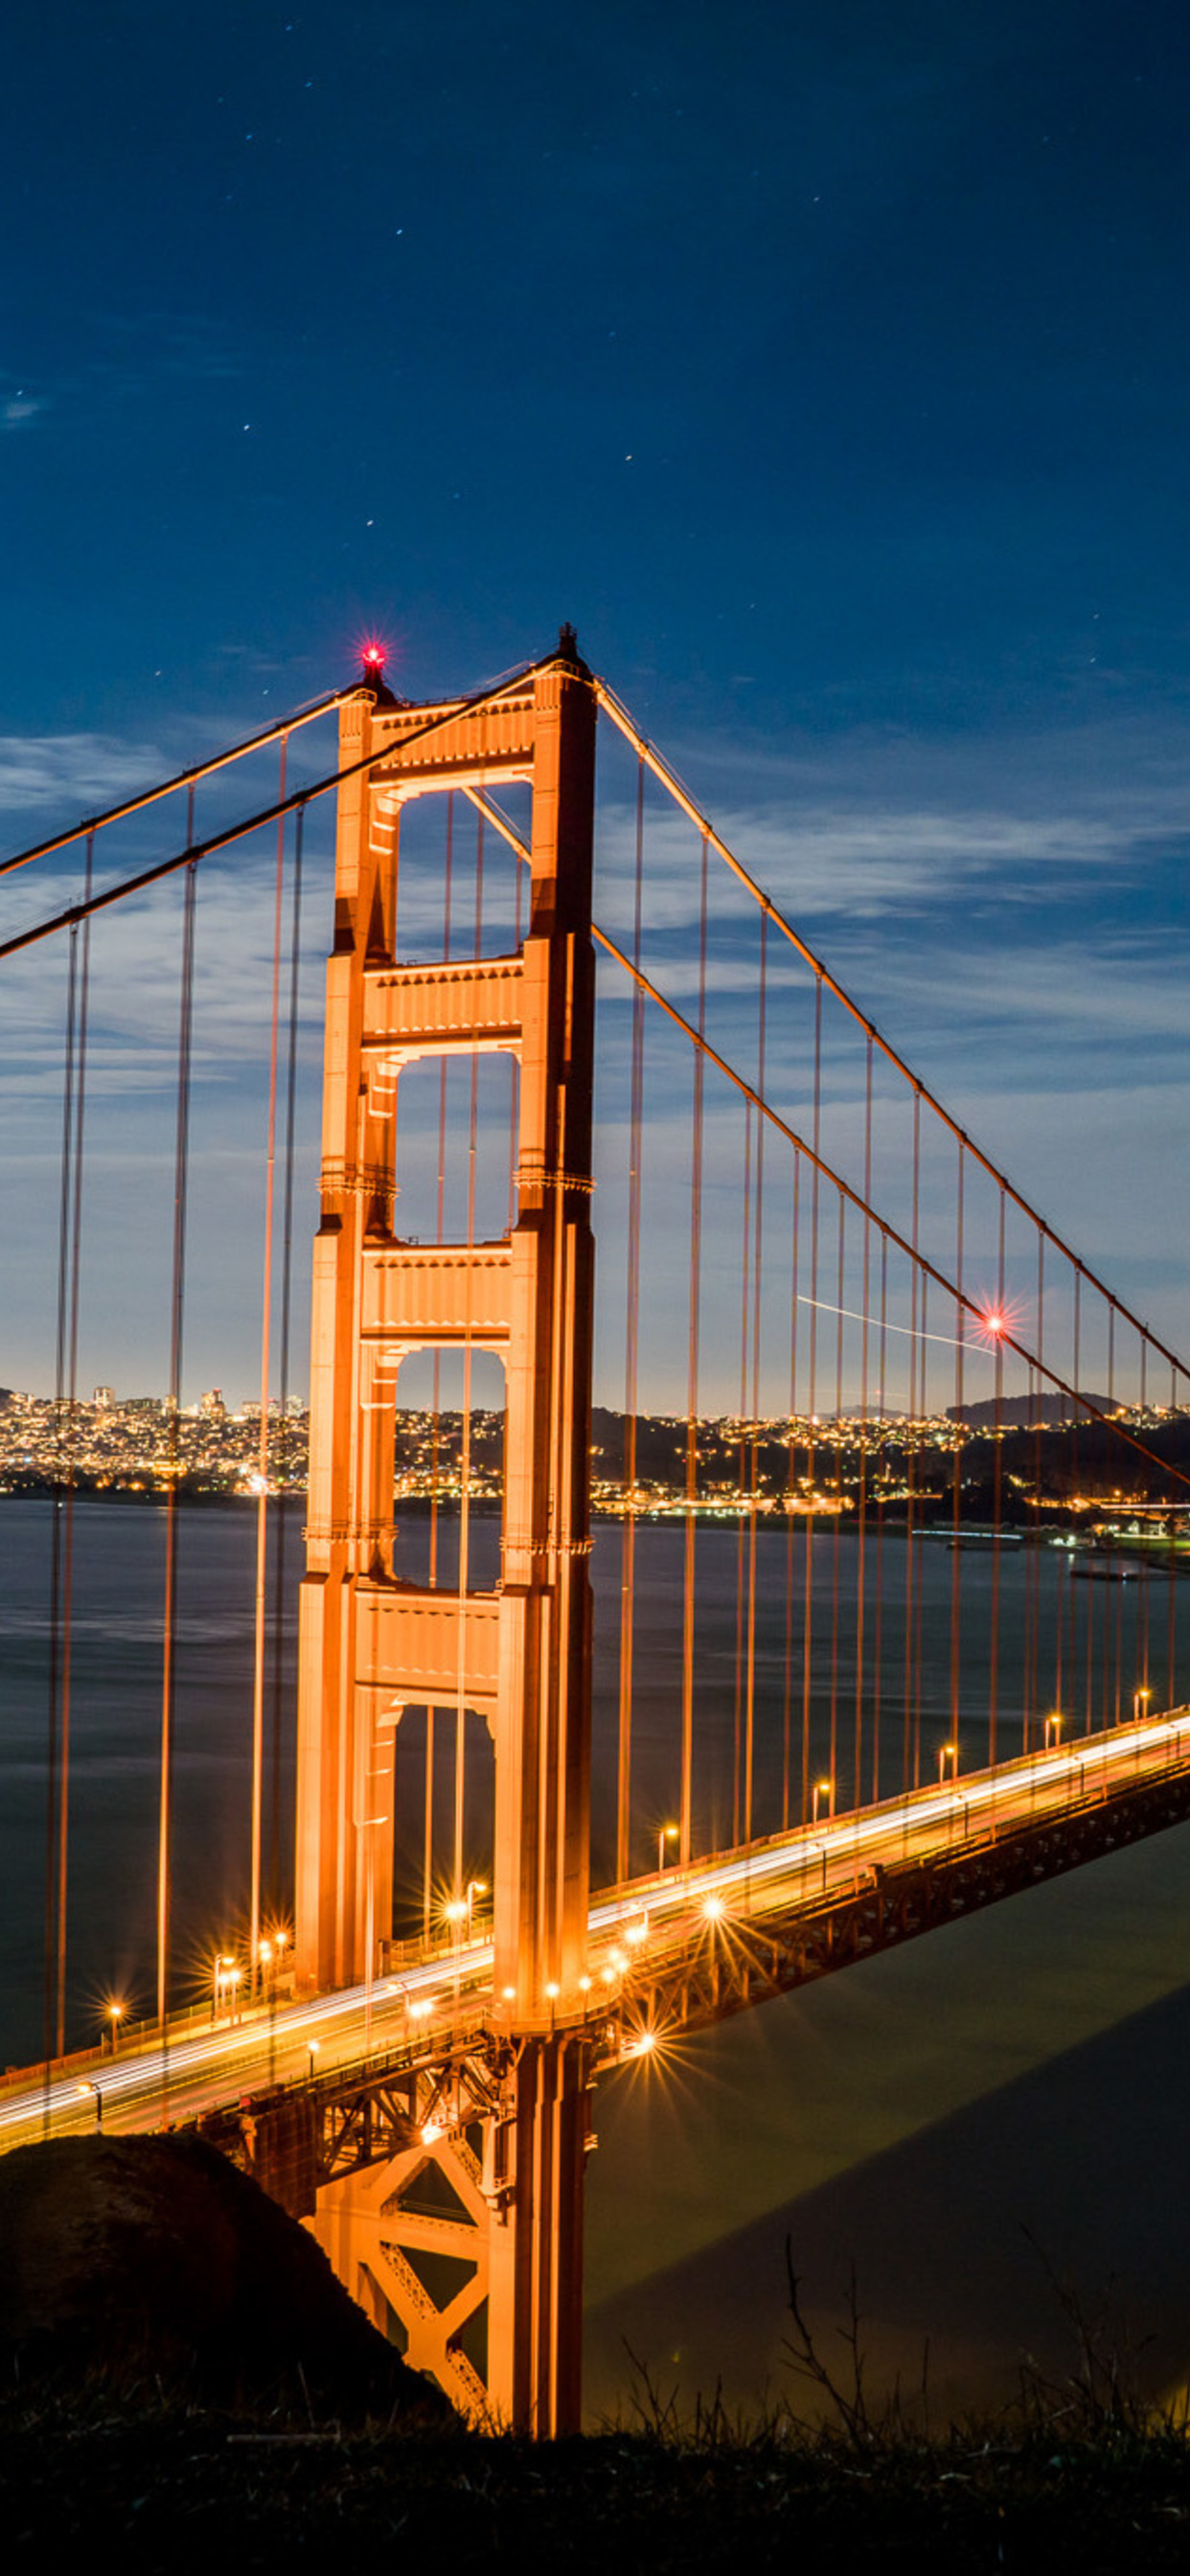 1242x2688 Golden Gate Bridge Iphone Xs Max Hd 4k Wallpapers